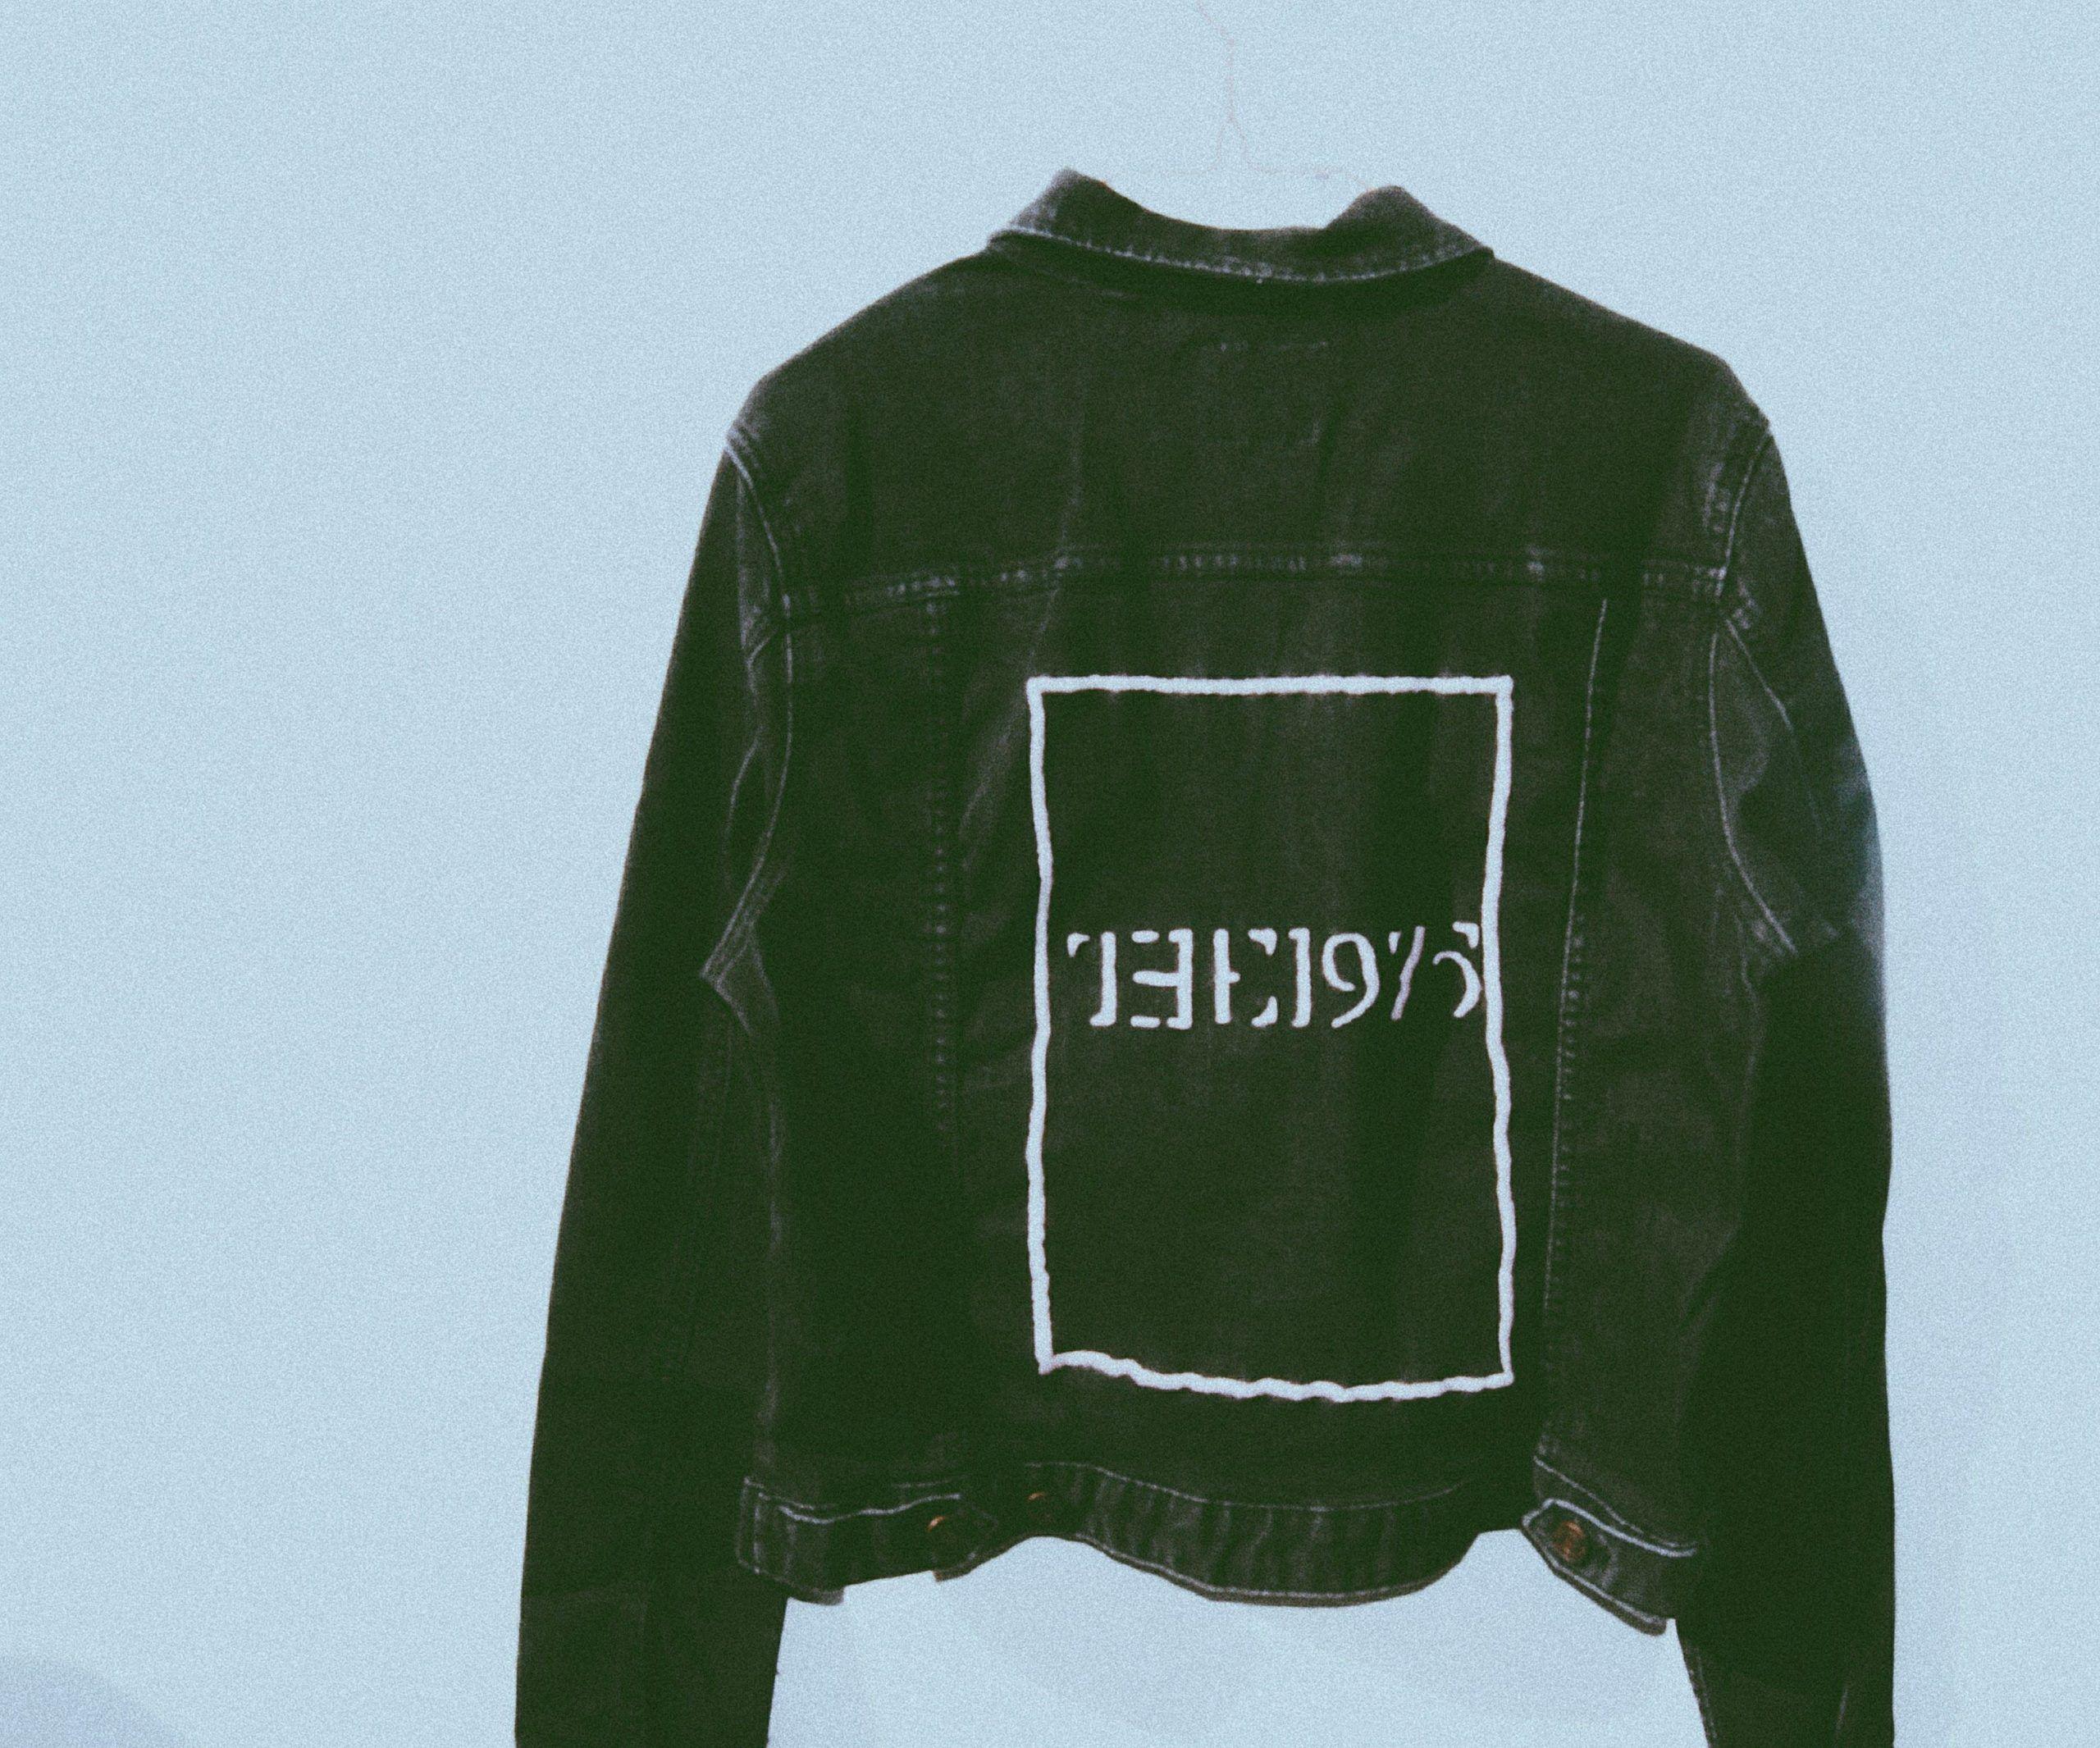 The 1975 custom made hand embroidered denim jacket #diy #embroidery #the1975 #cu...#custom #denim #diy #embroidered #embroidery #hand #jacket #the1975